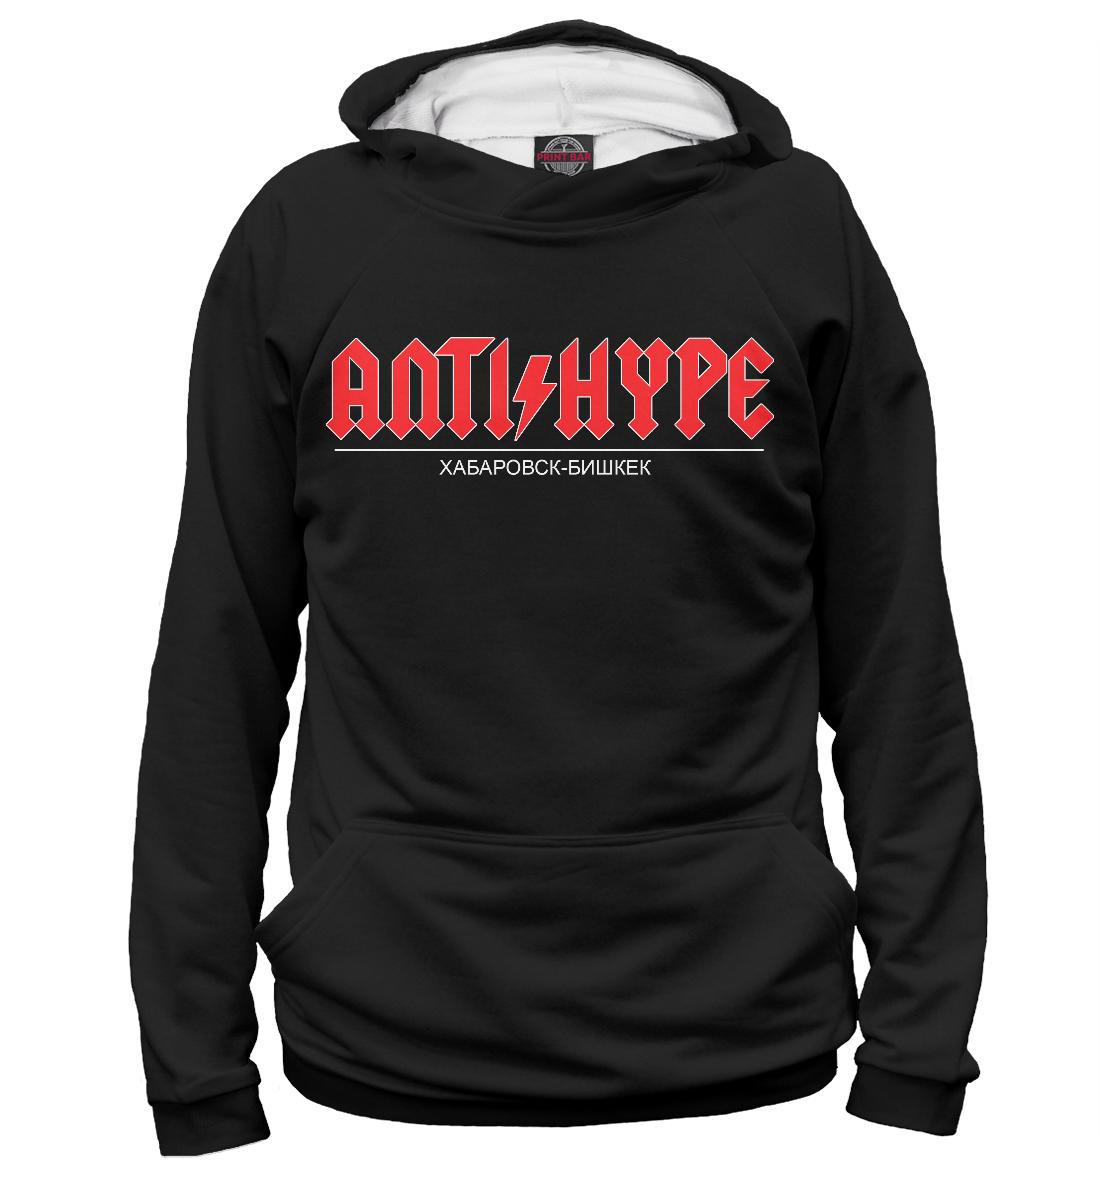 Купить Антихайп Хабаровск-Бишкек, Printbar, Худи, APD-320720-hud-1